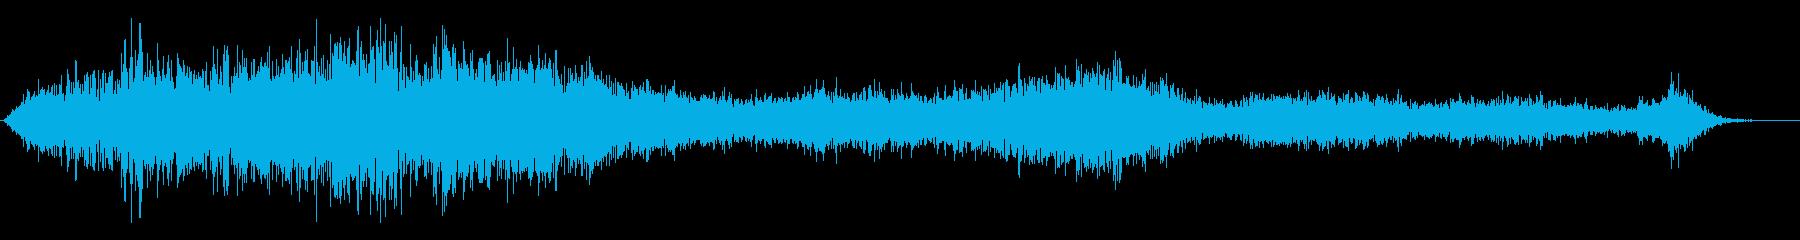 Sonaコレクターポッド:コレクタ...の再生済みの波形